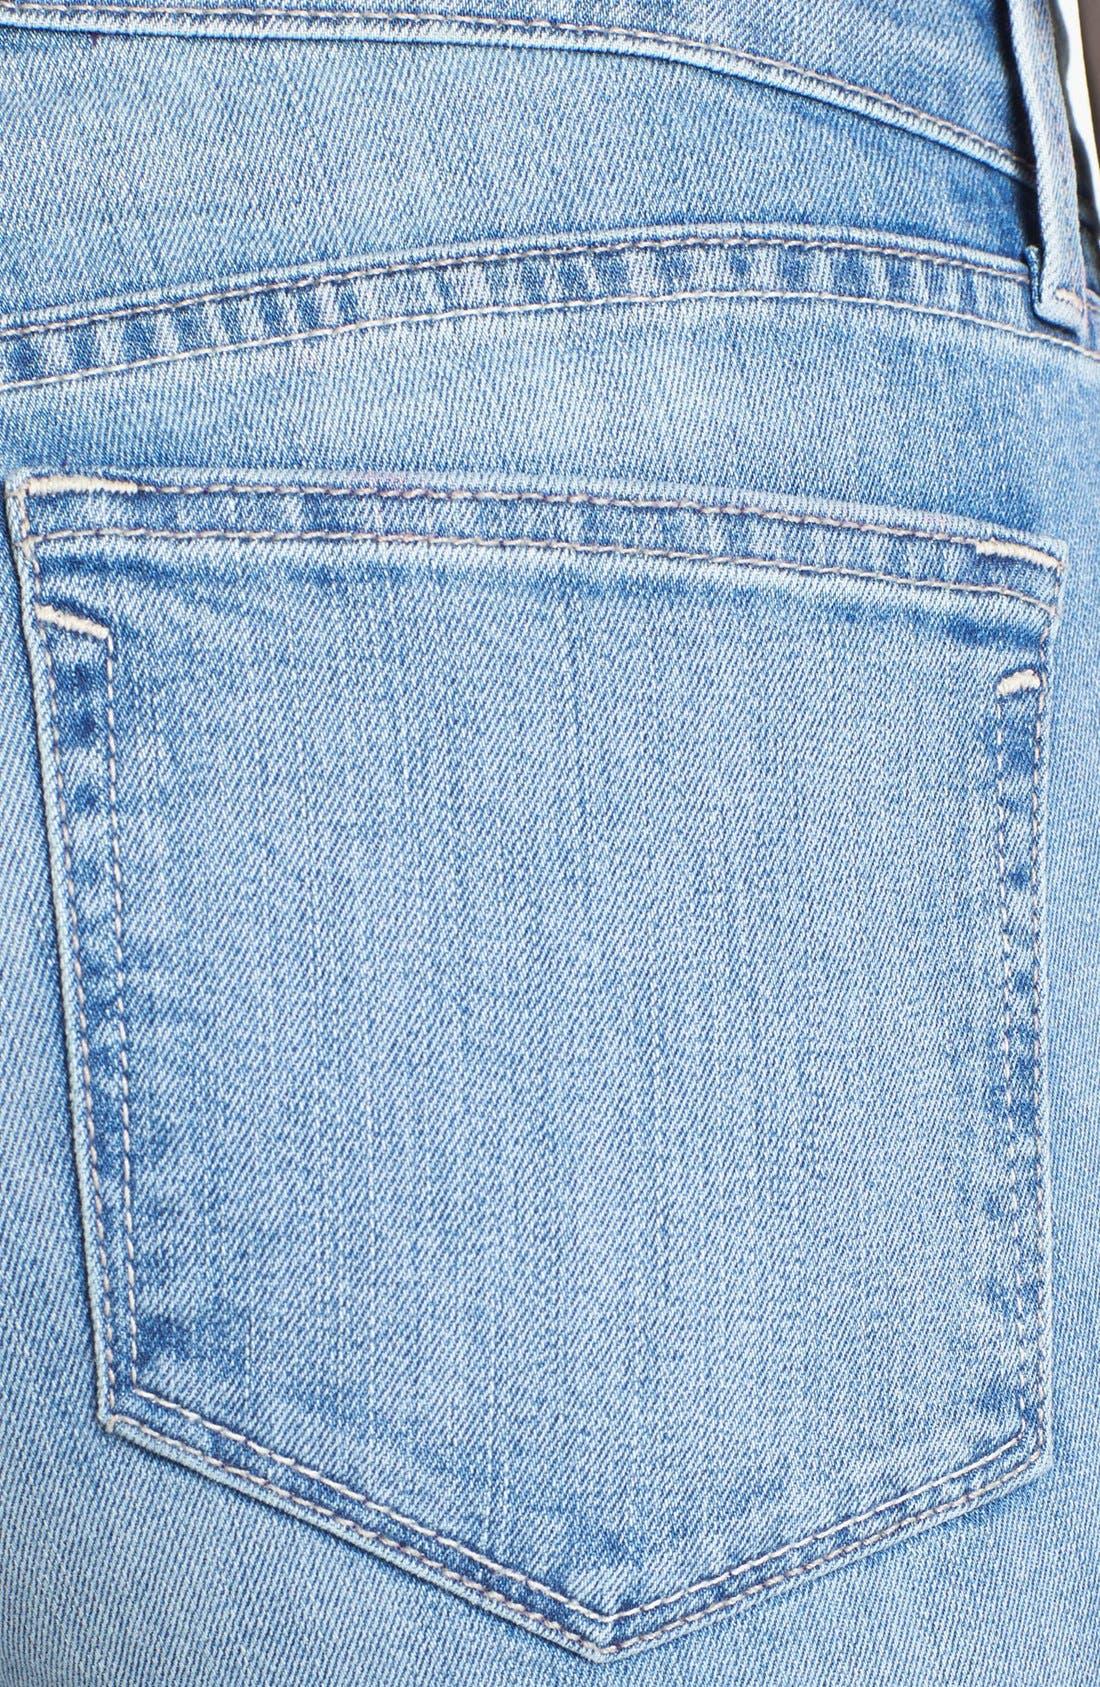 Alternate Image 4  - NYDJ 'Alina' Stretch Skinny Jeans (Sacramento) (Petite)